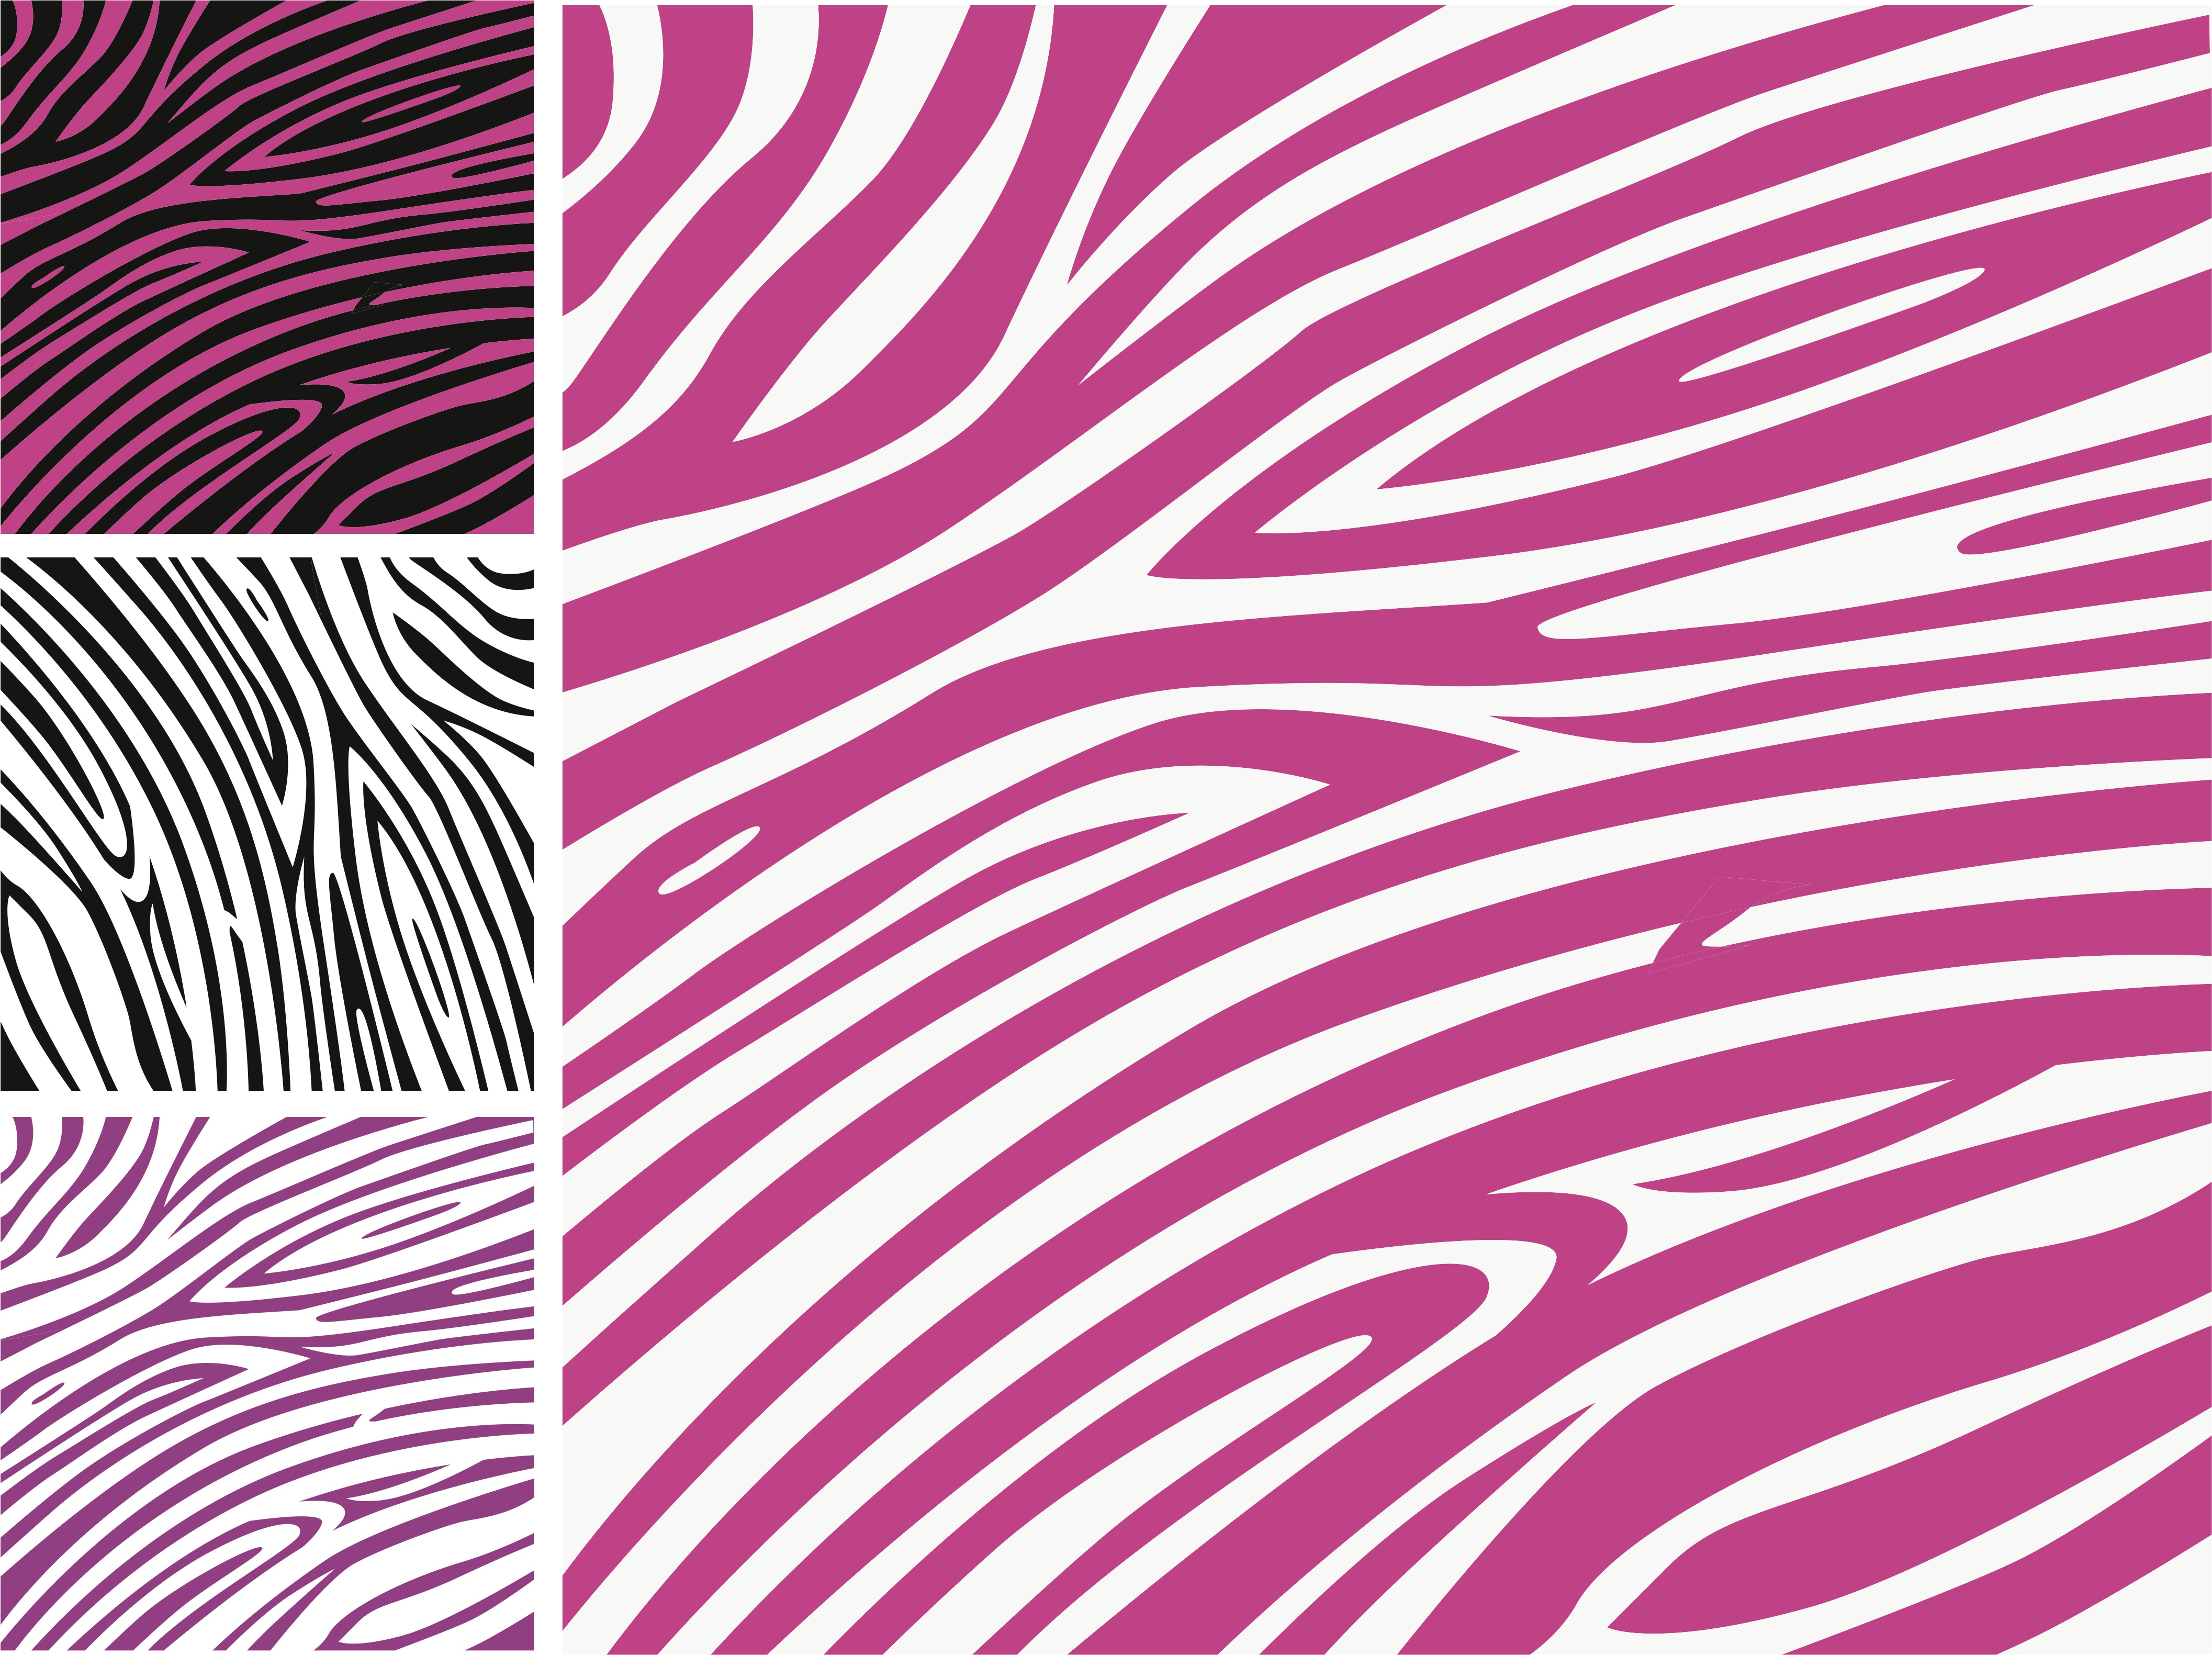 Zebra Wallpaper 4227x3162